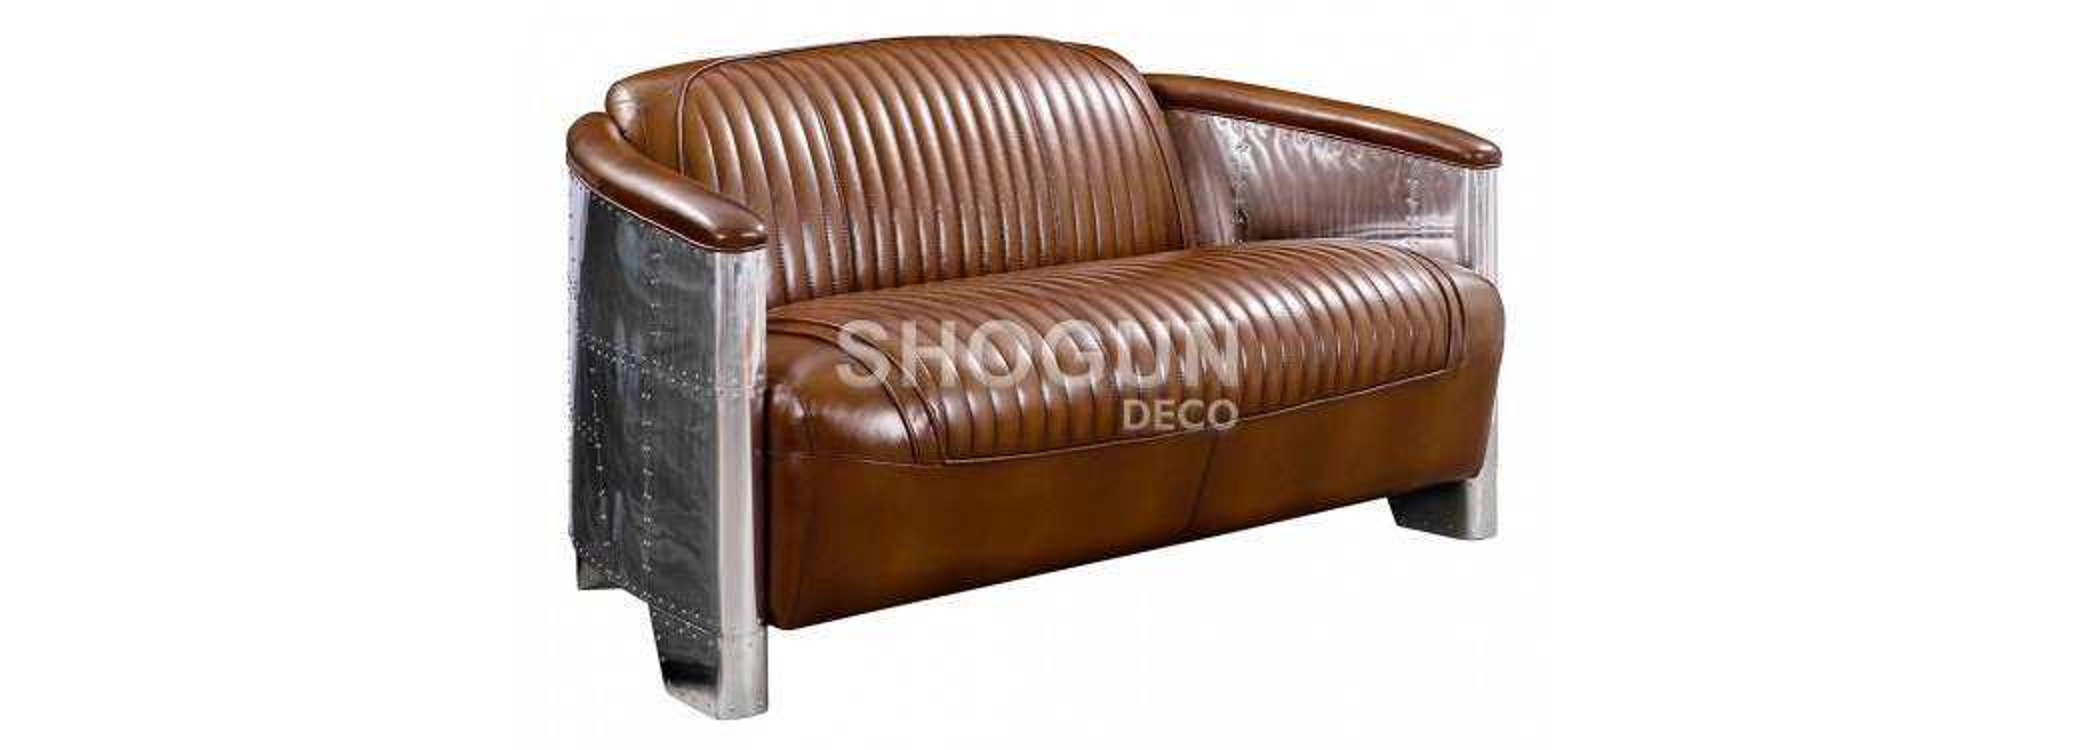 Aviator sofa - Brown leather